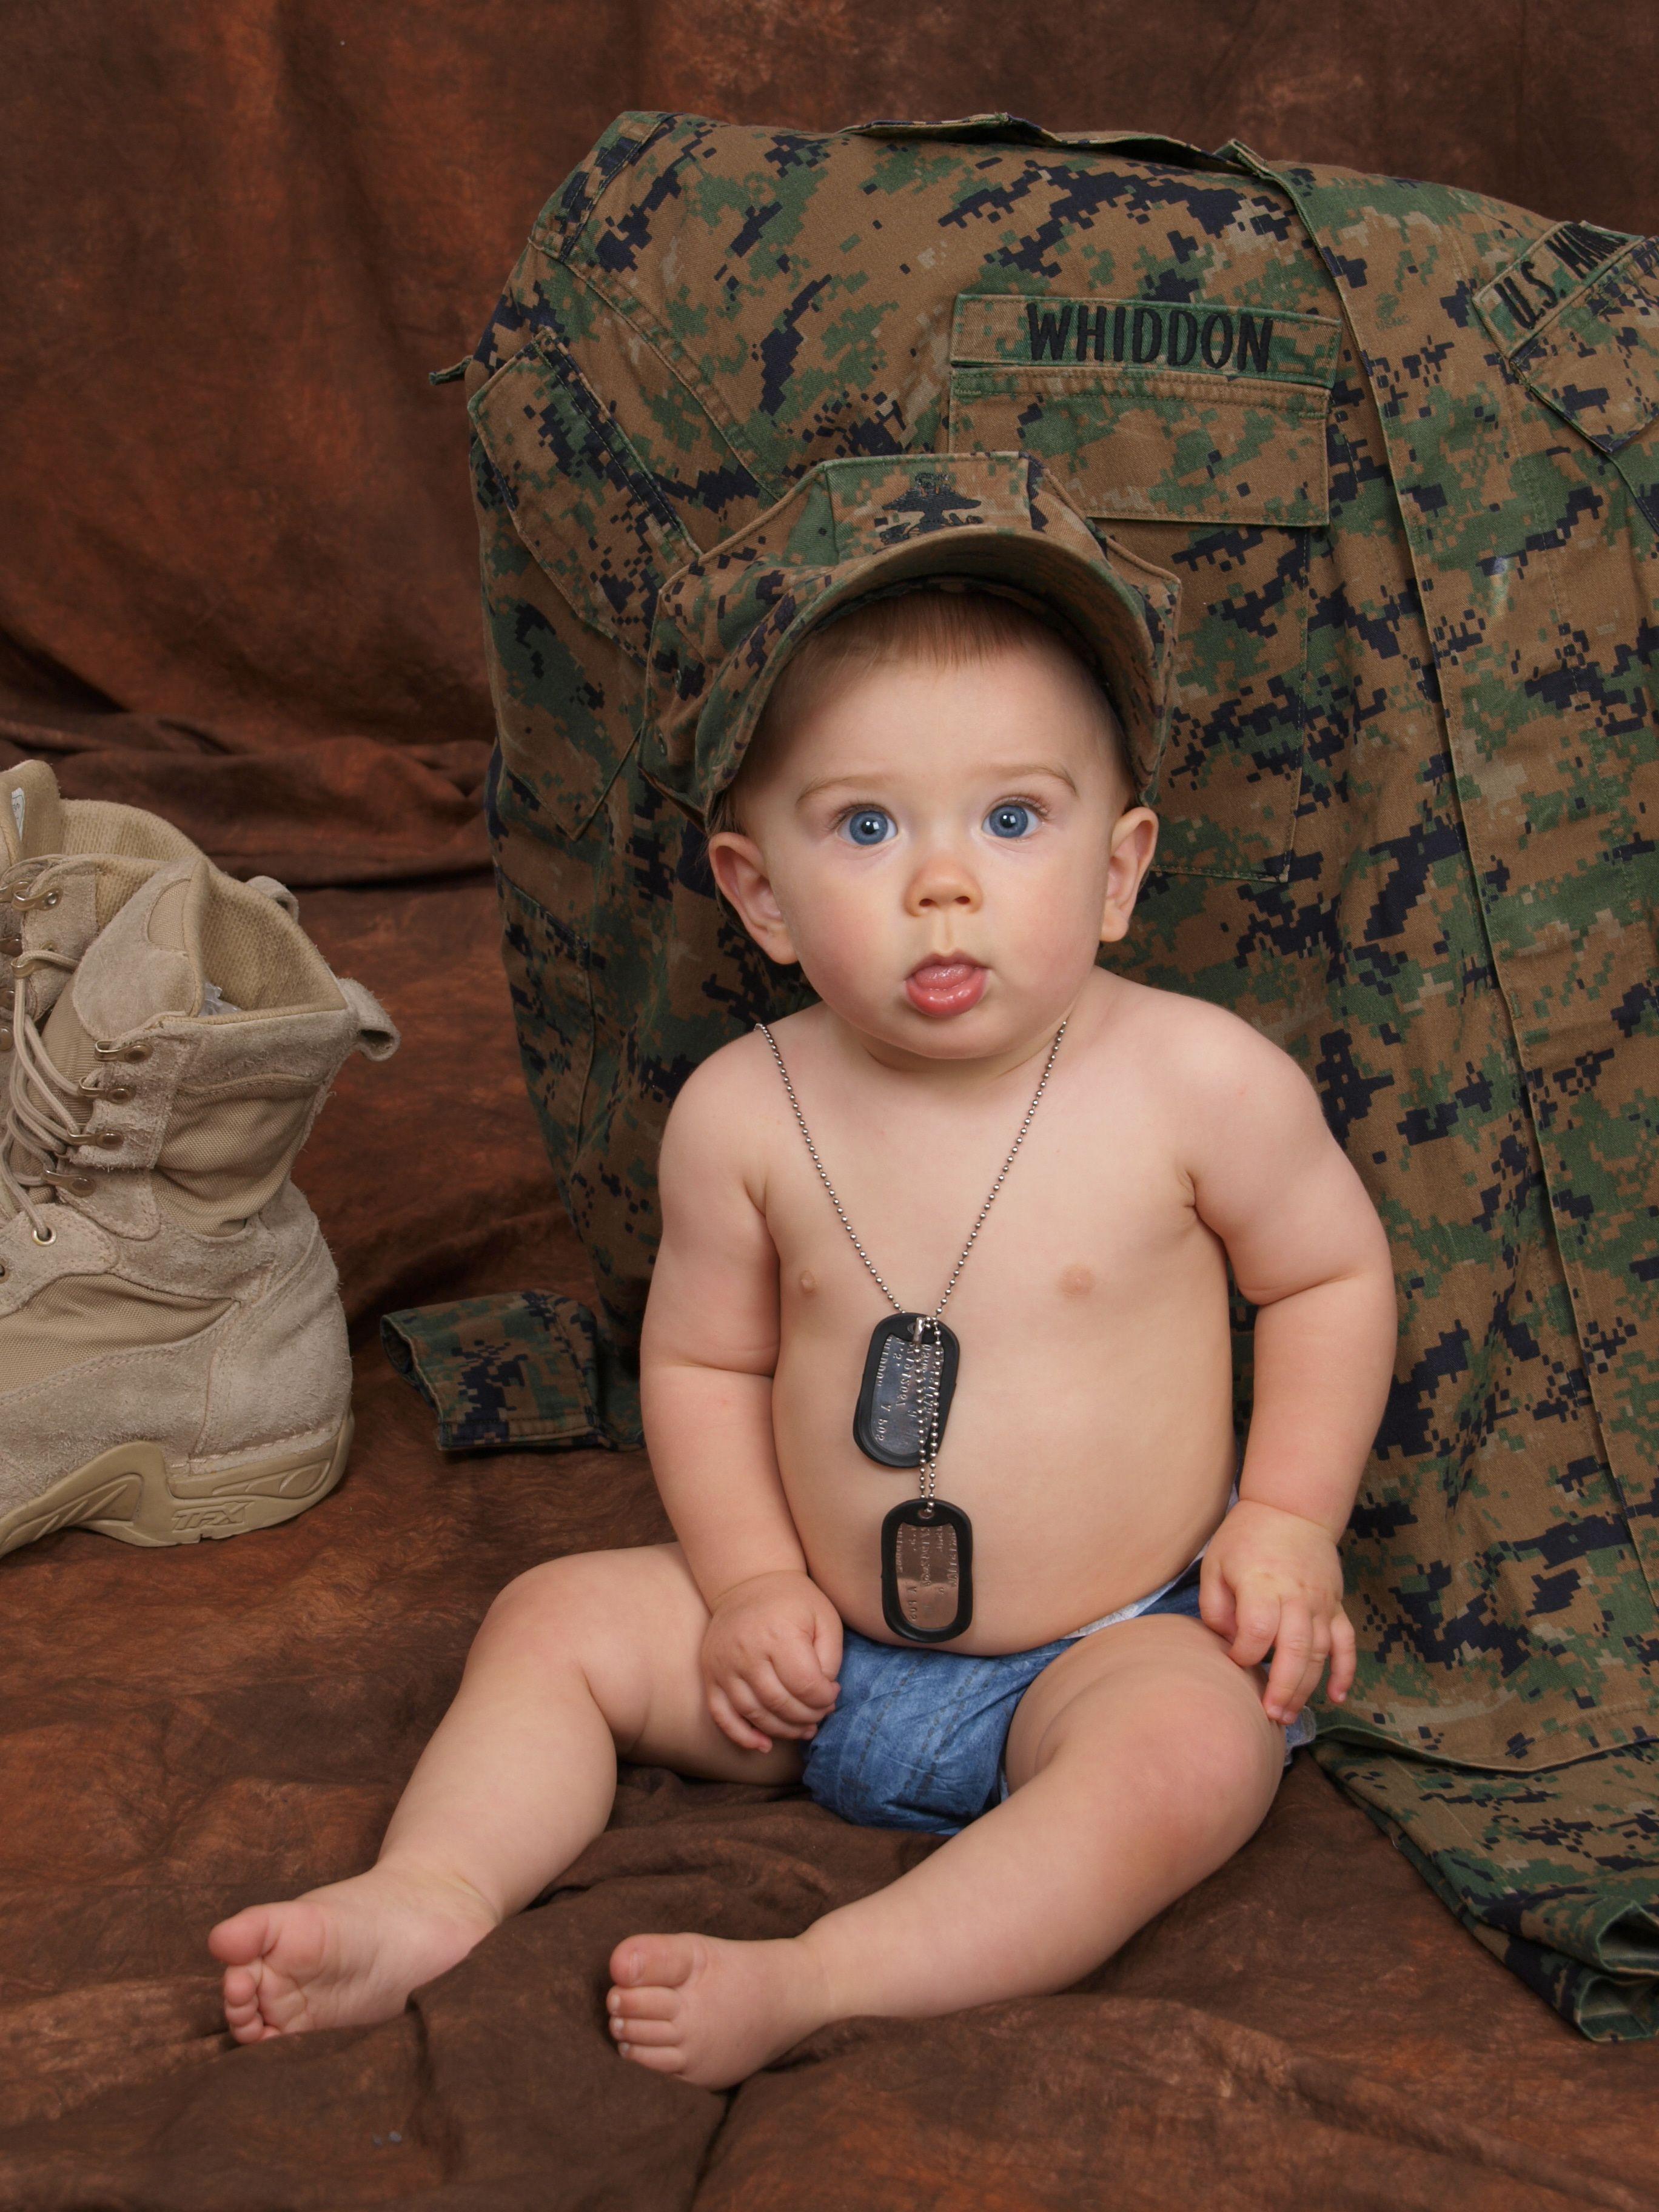 872e4d74 Military Brat... Proud son of a U.S Marine Military Brat, Kid Poses